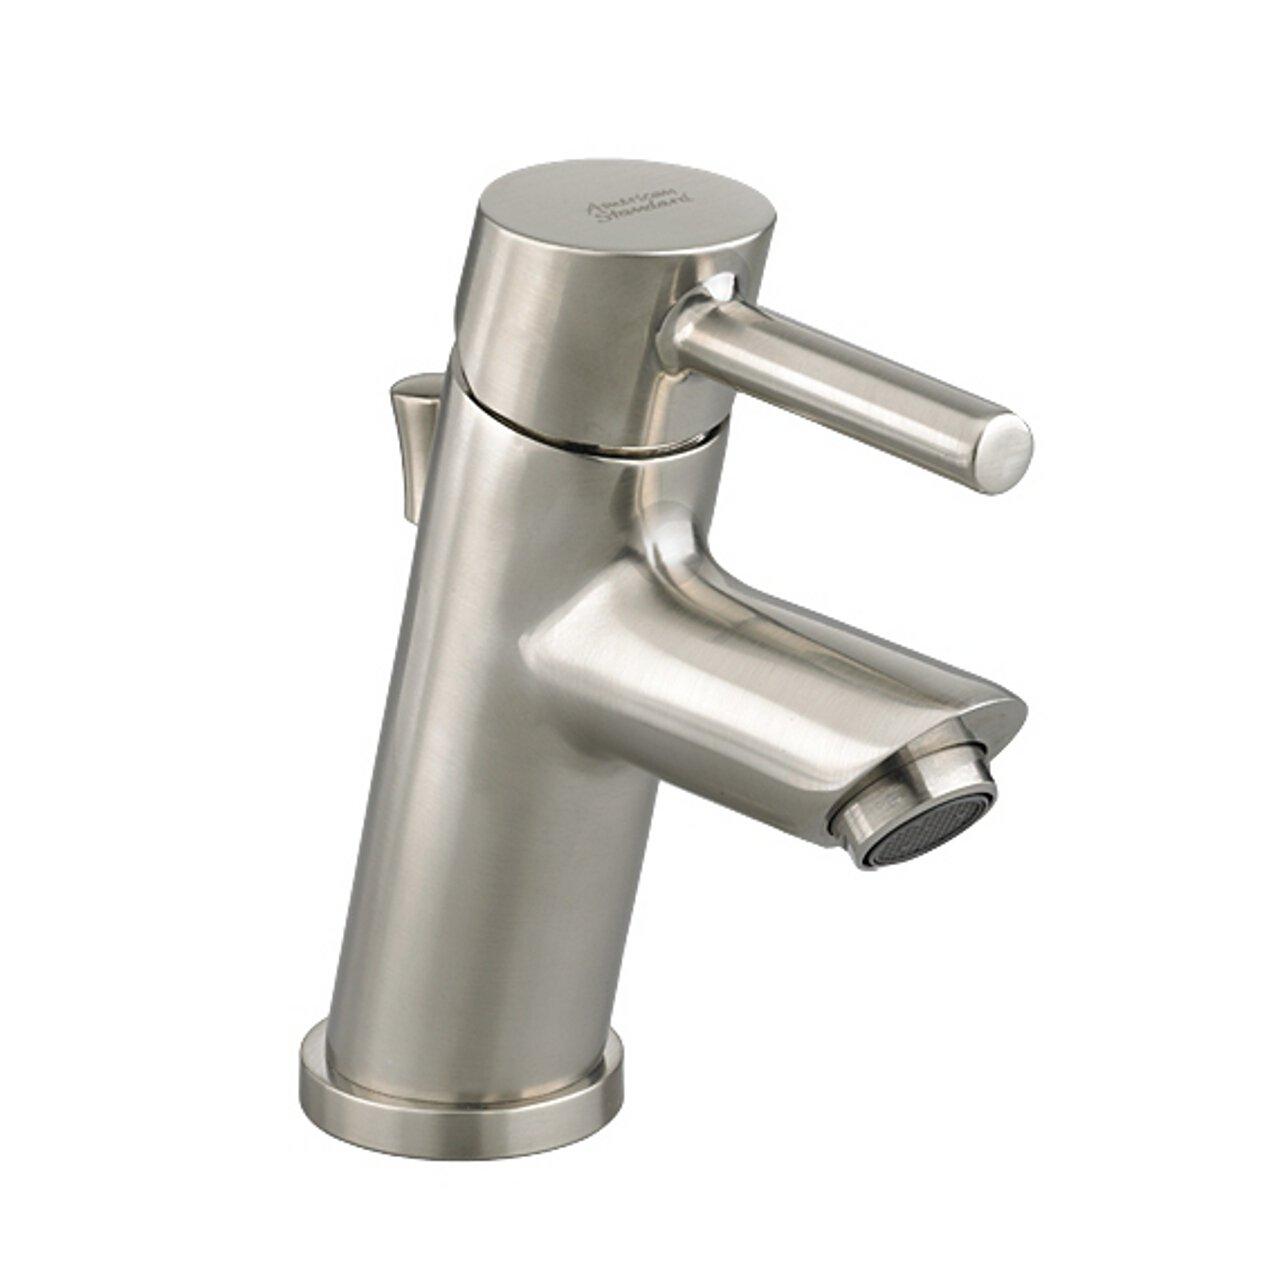 amazon com american standard 2064 131 002 serin petite single amazon com american standard 2064 131 002 serin petite single handle monoblock bathroom sink faucet chrome home improvement